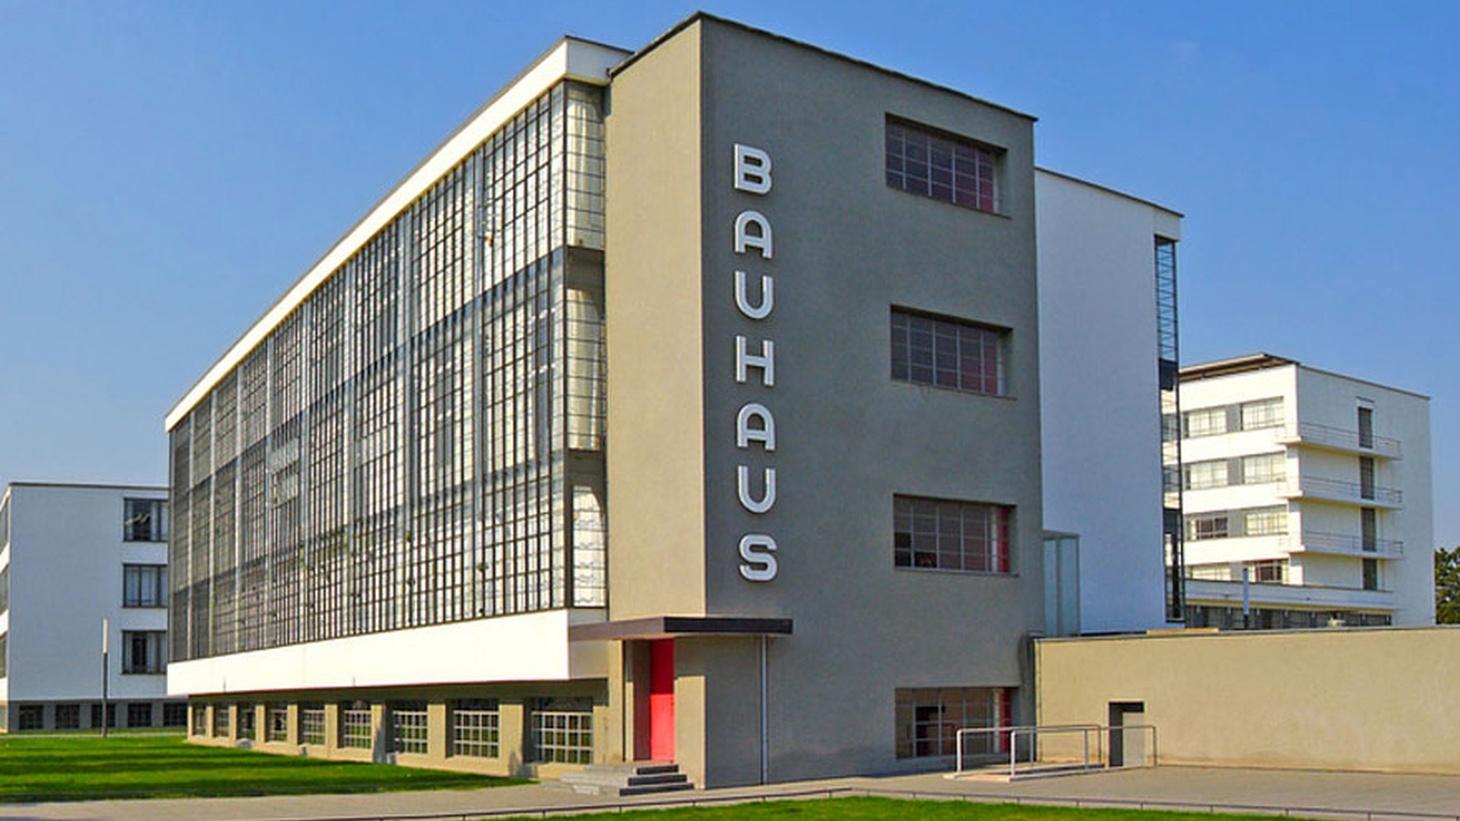 The Bauhaus building in Dessau.